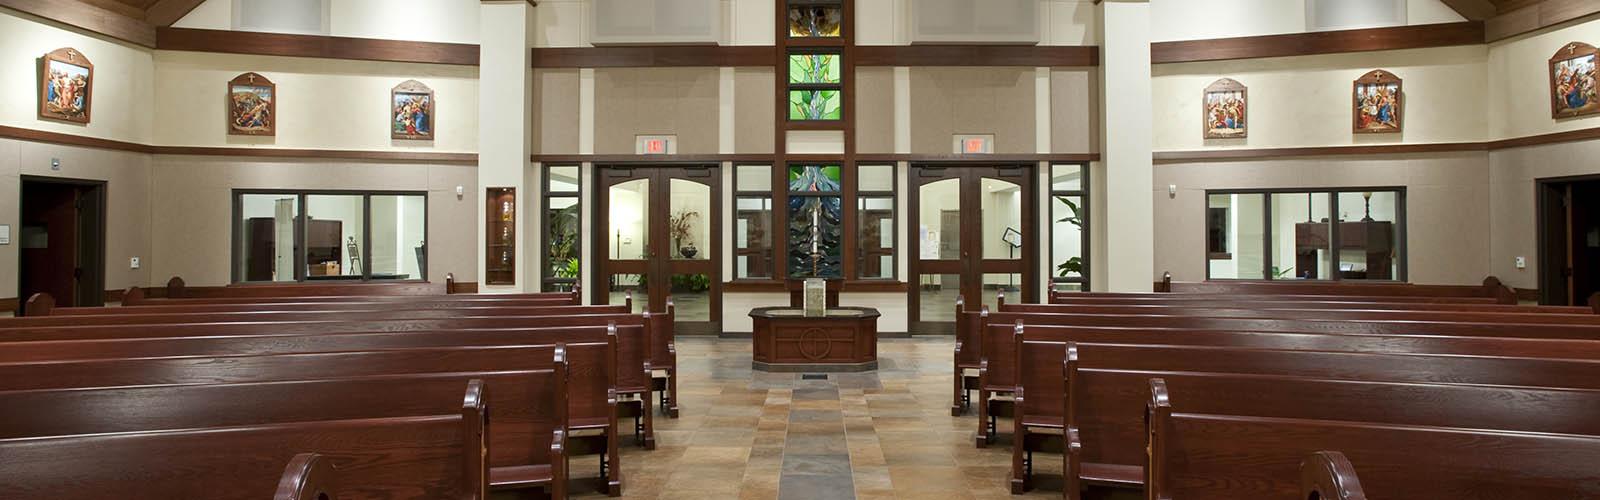 Good Shepherd Catholic Church 4